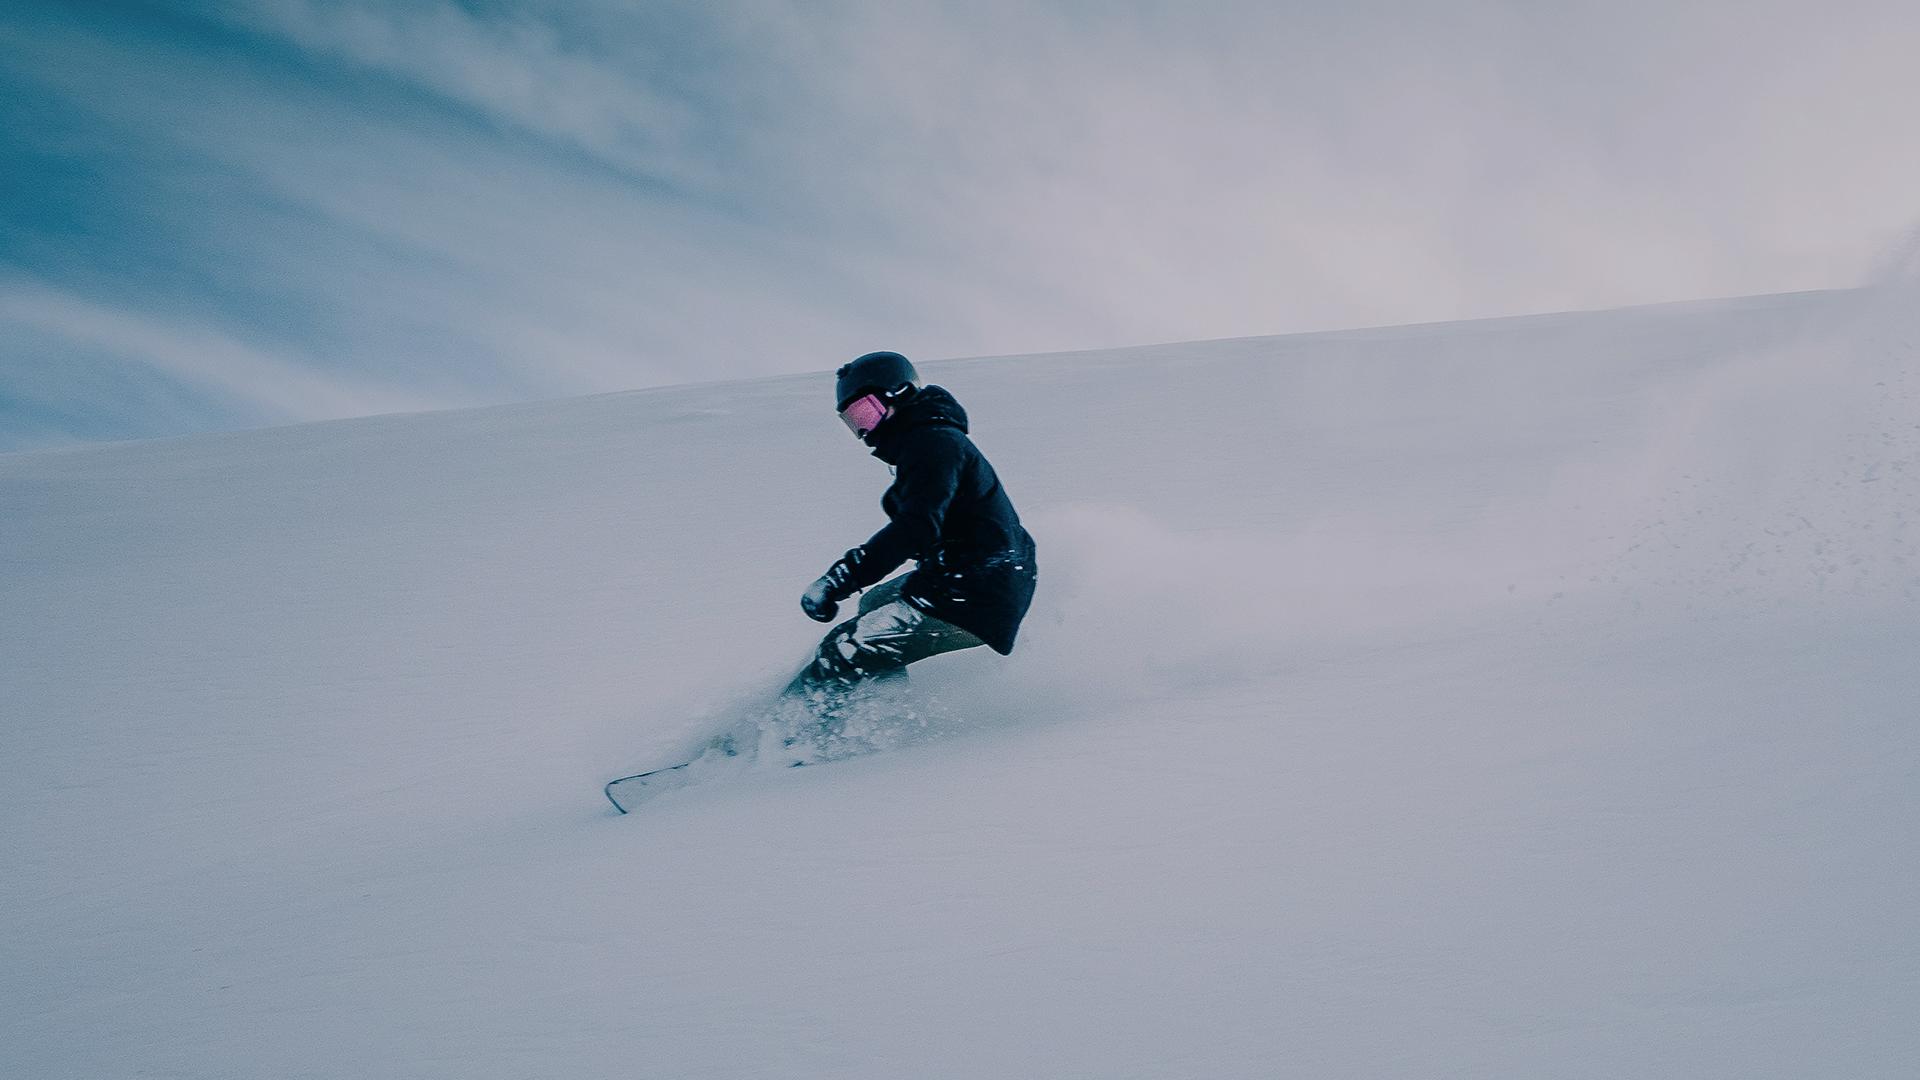 Australia's leading ski resort destination with a portfolio of e-commerce websites